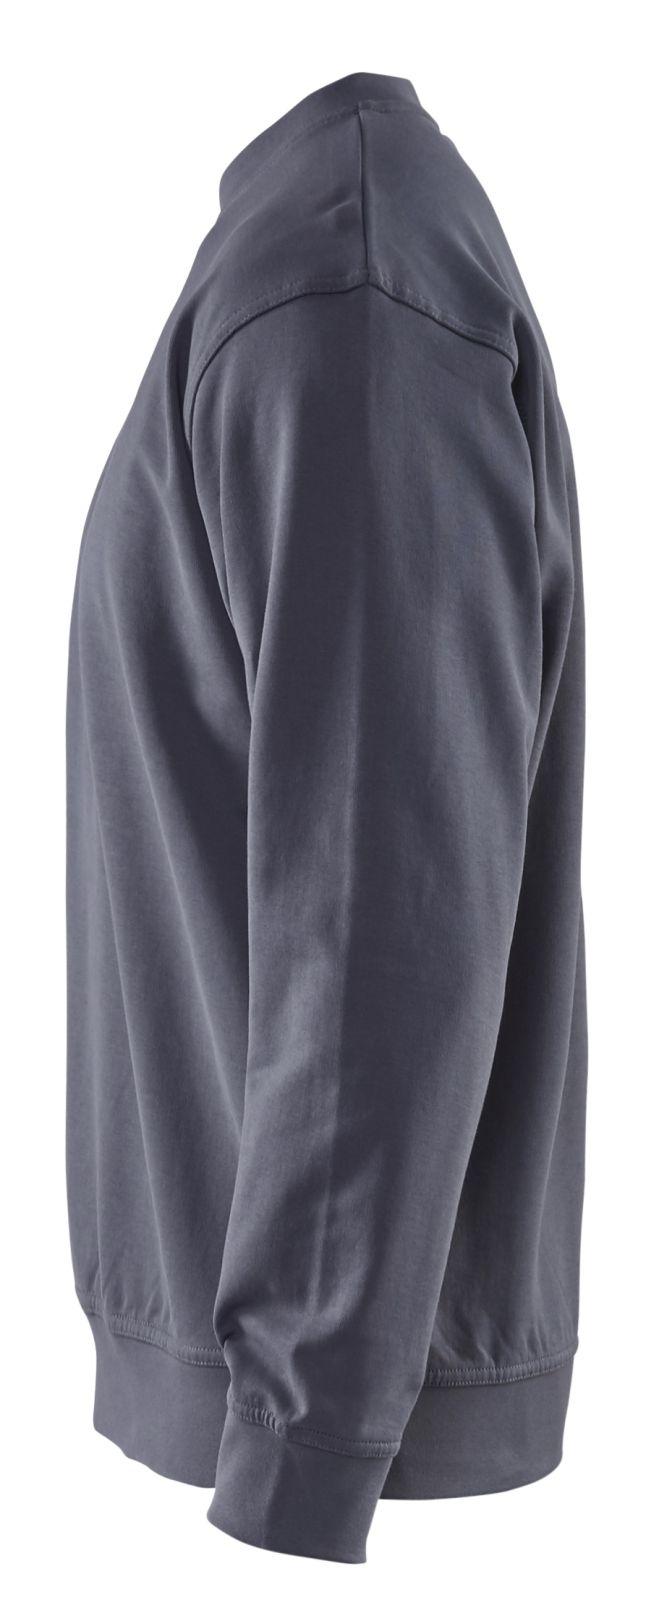 Blaklader Truien 33401158 grijs(9400)